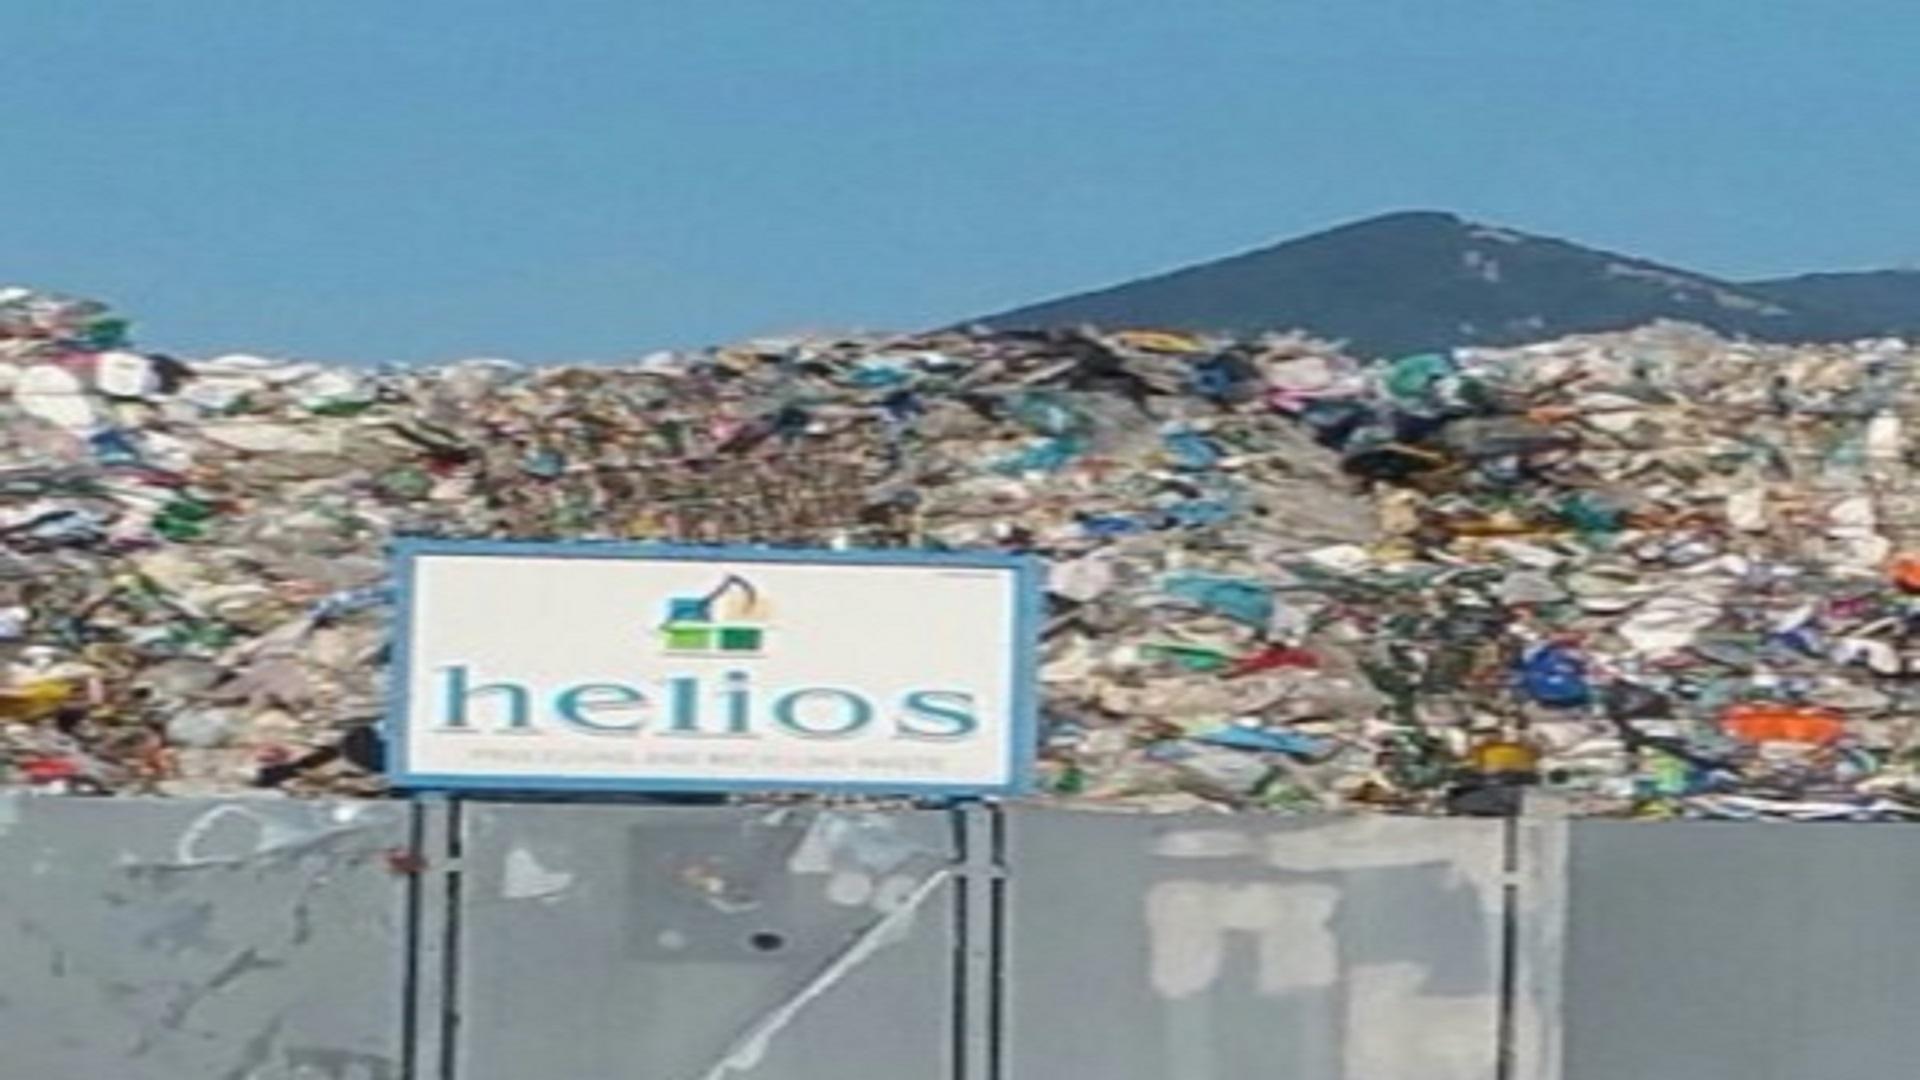 1-helios-1-300x336